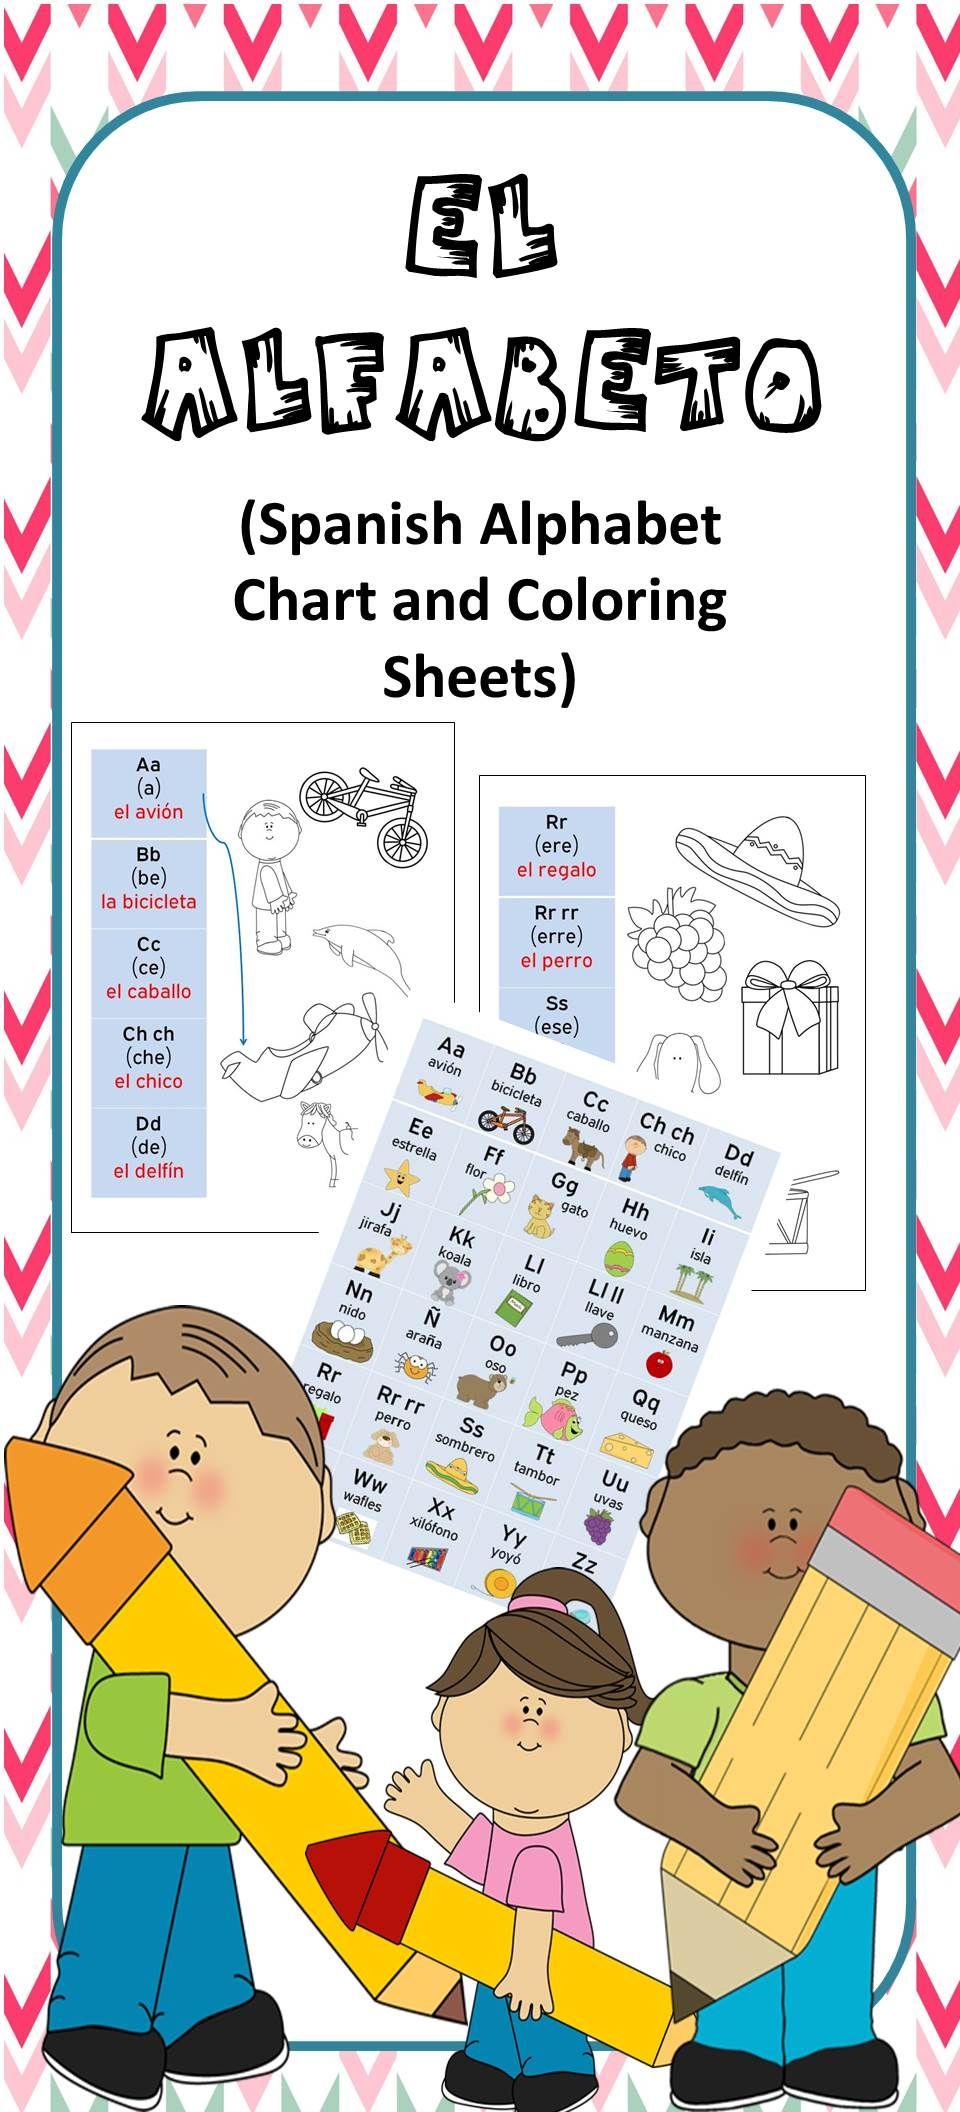 El Alfabeto Spanish Alphabet Chart And Coloring Sheets Spanish Alphabet Chart Spanish Teacher Resources Spanish Alphabet [ 2112 x 960 Pixel ]